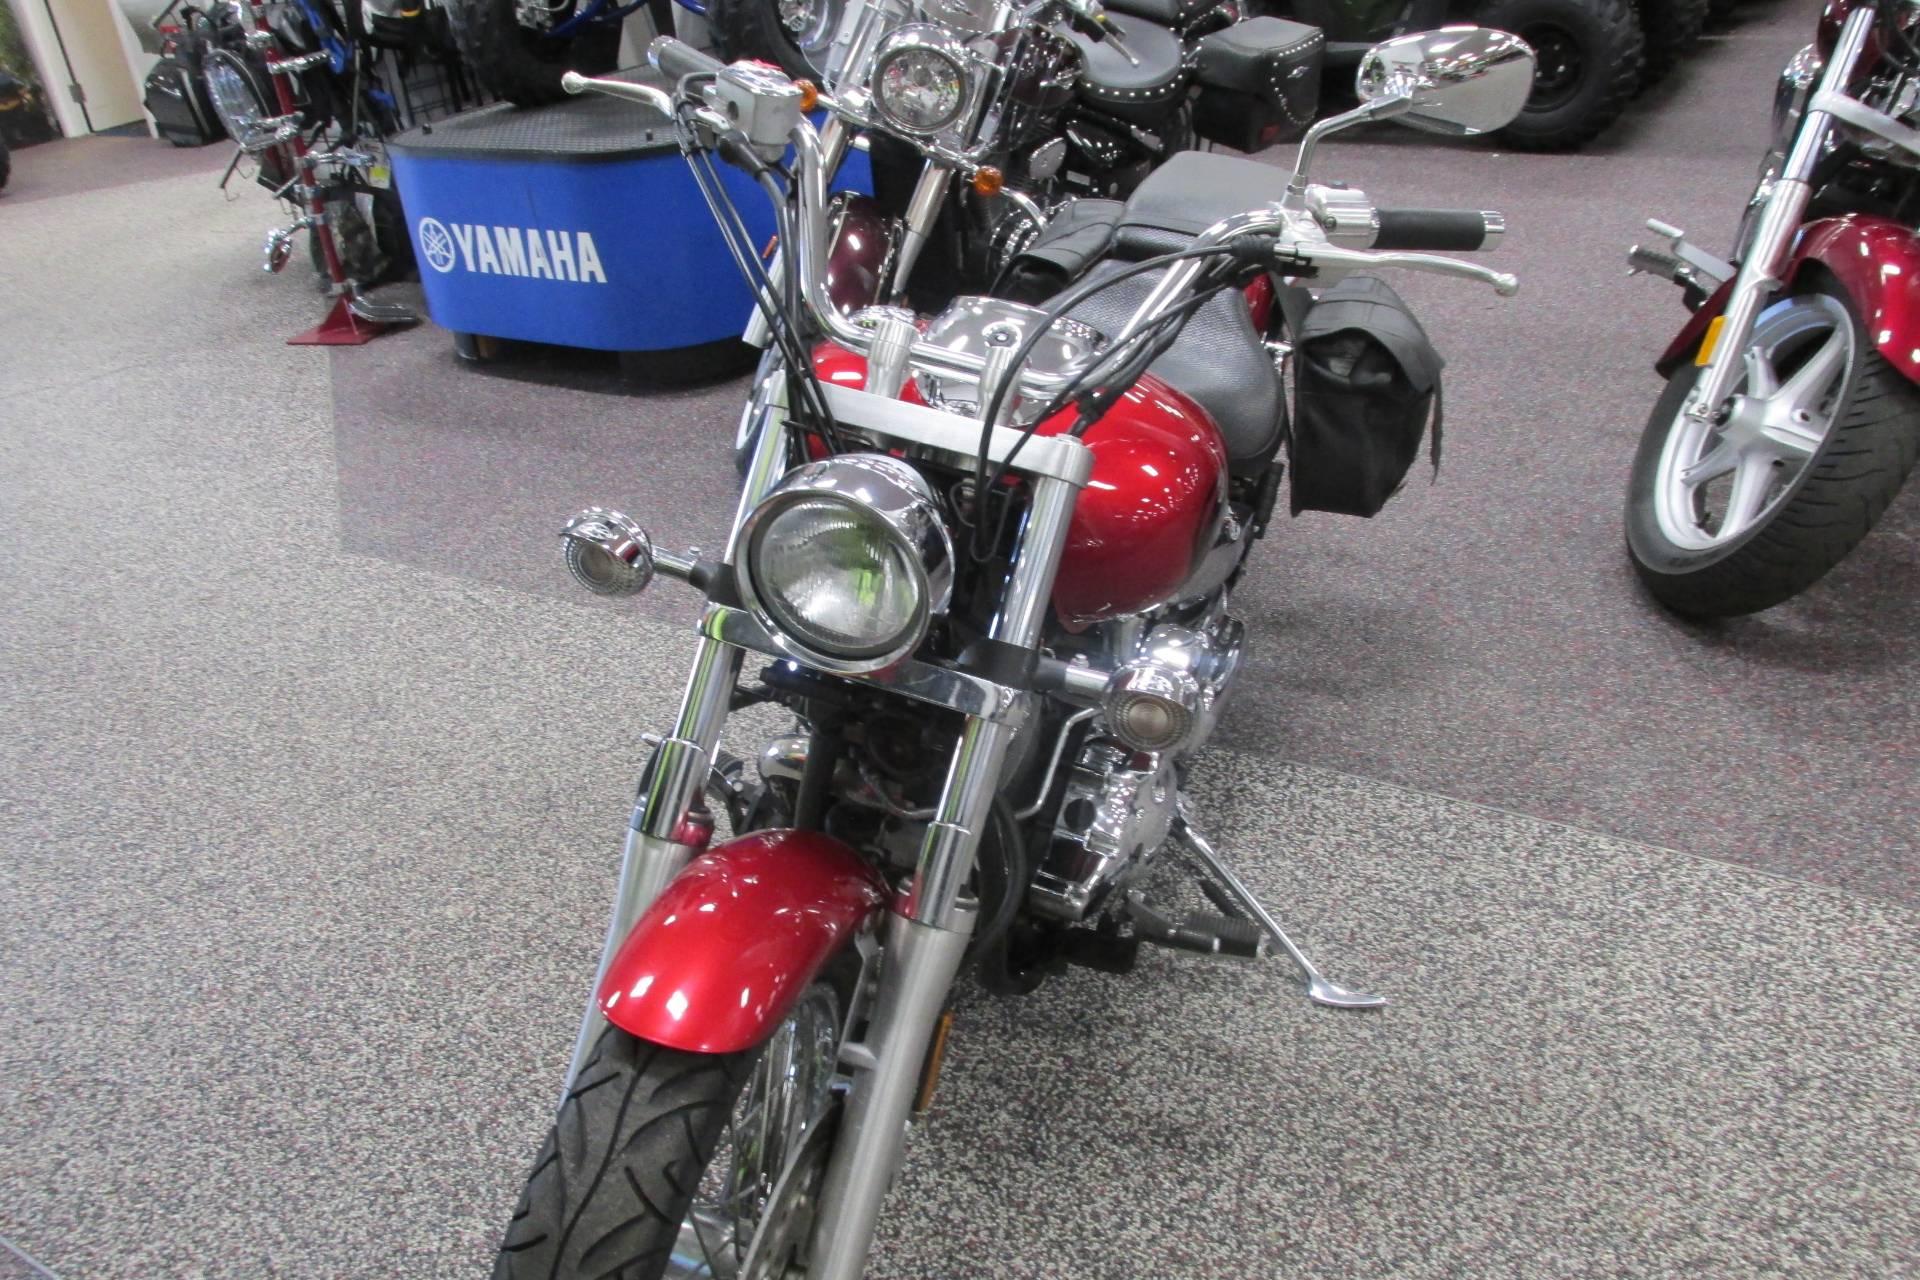 2009 Yamaha VSTAR 1100 CLASSIC 3